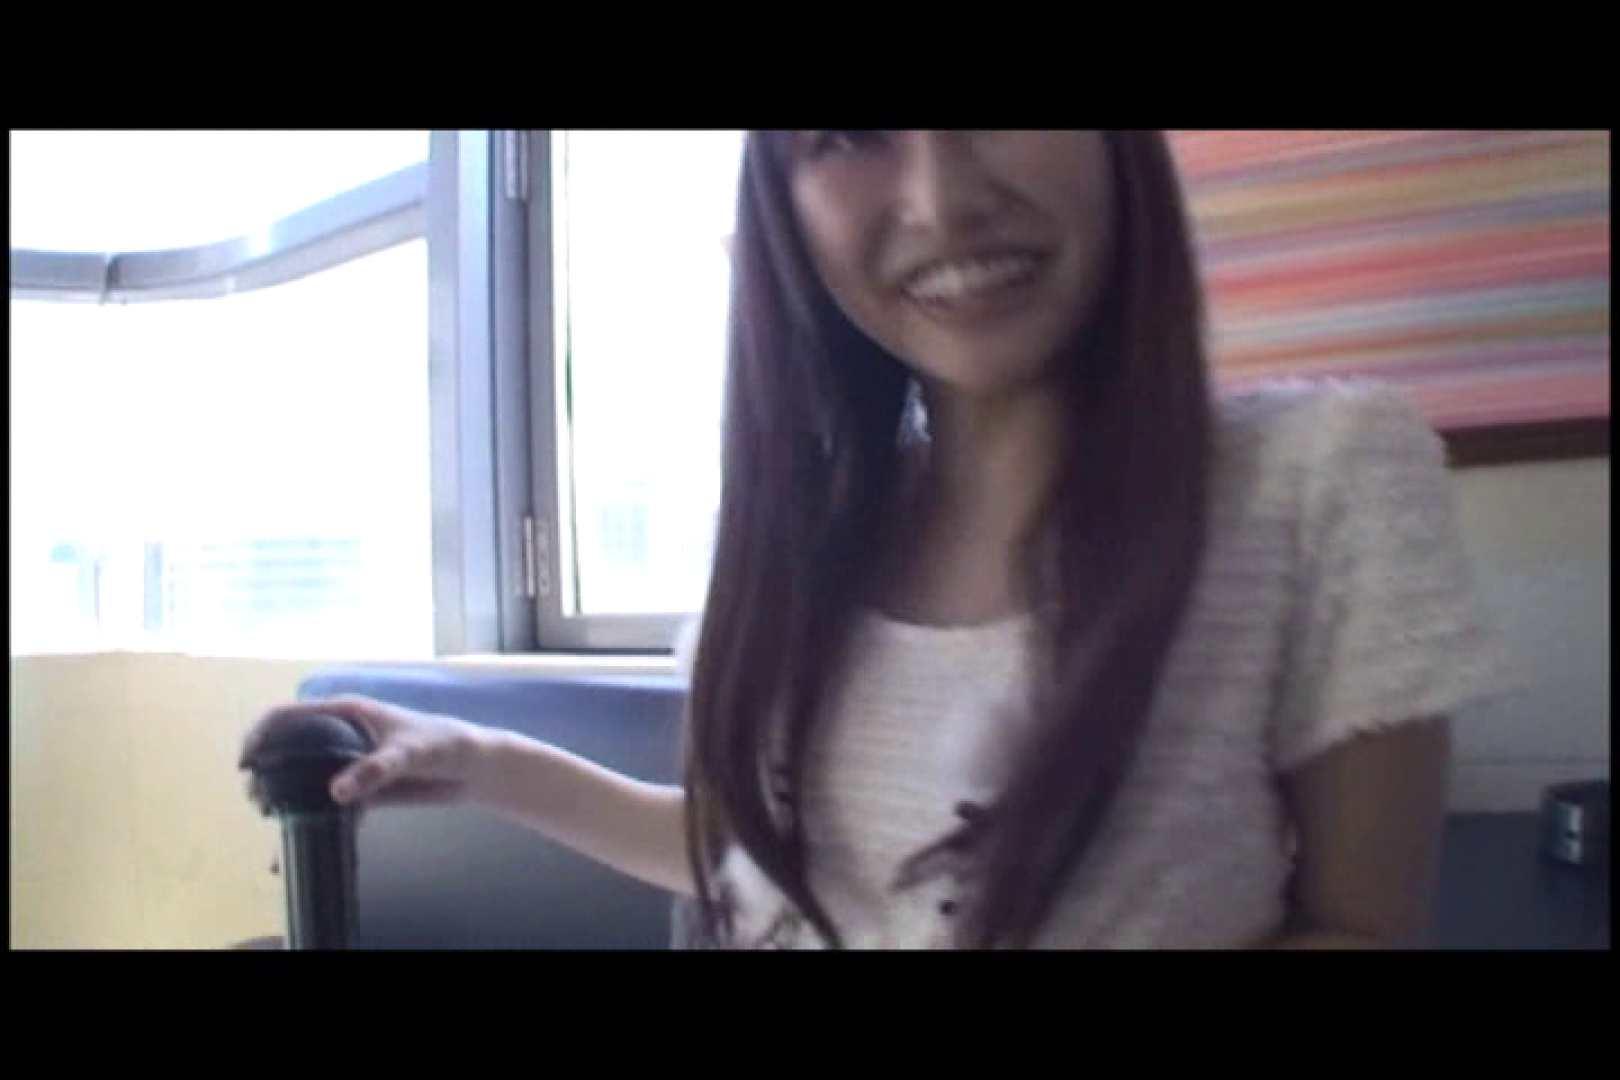 JDハンター全国ツアー vol.058 前編 女子大生のエロ動画  77PIX 4